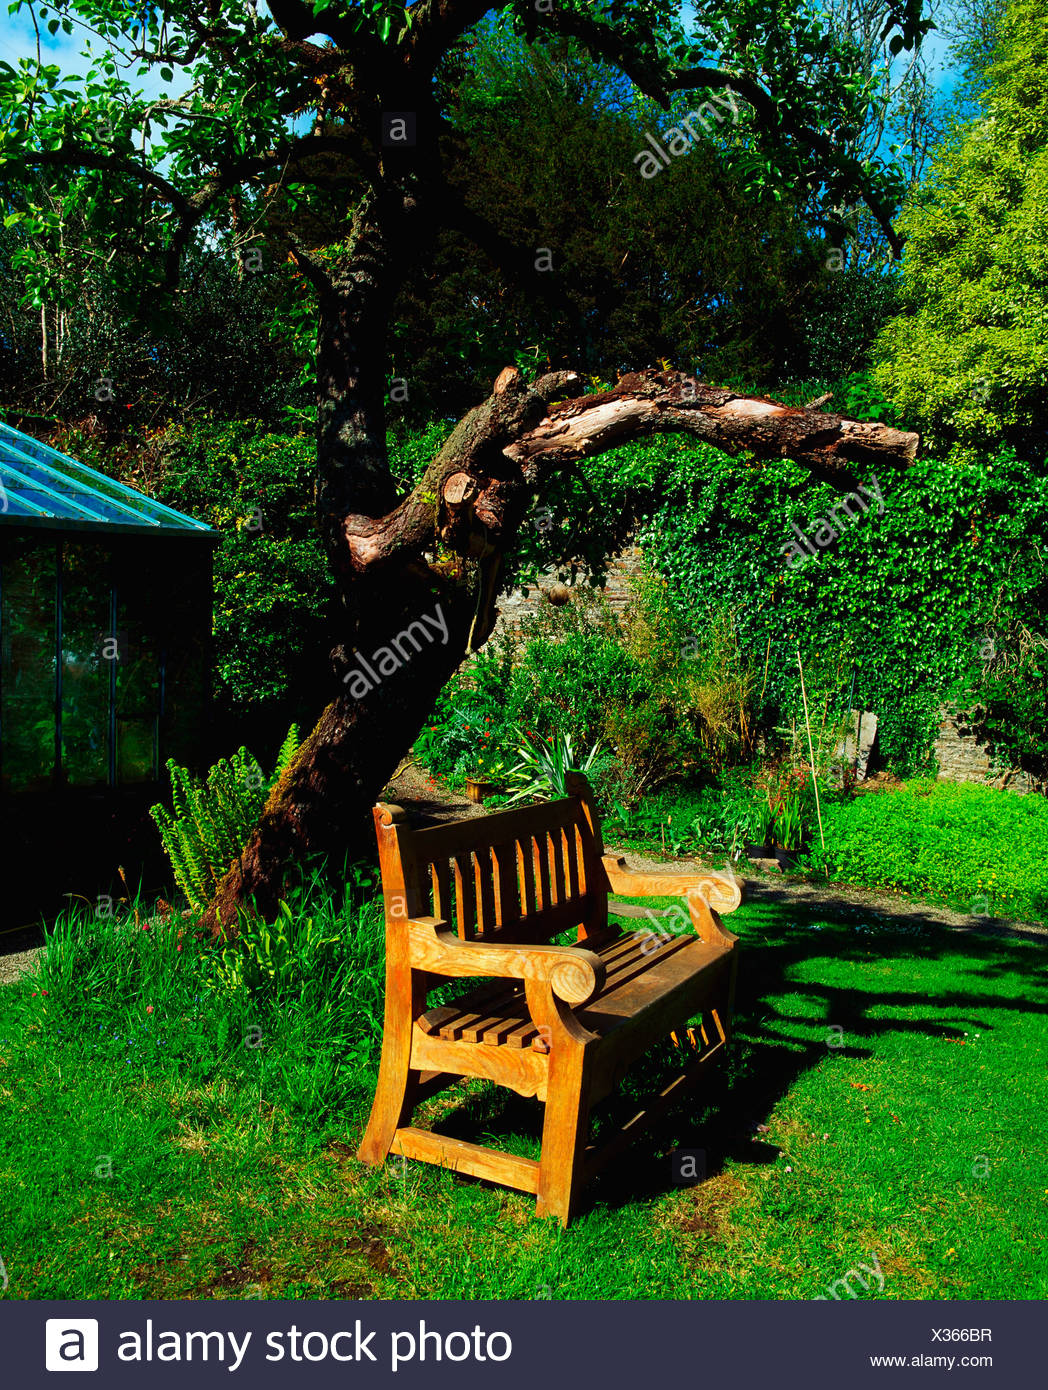 Creagh Baltimore Co Cork, Garden Bench under old Tree, The Walled Garden Late Summer - Stock Image